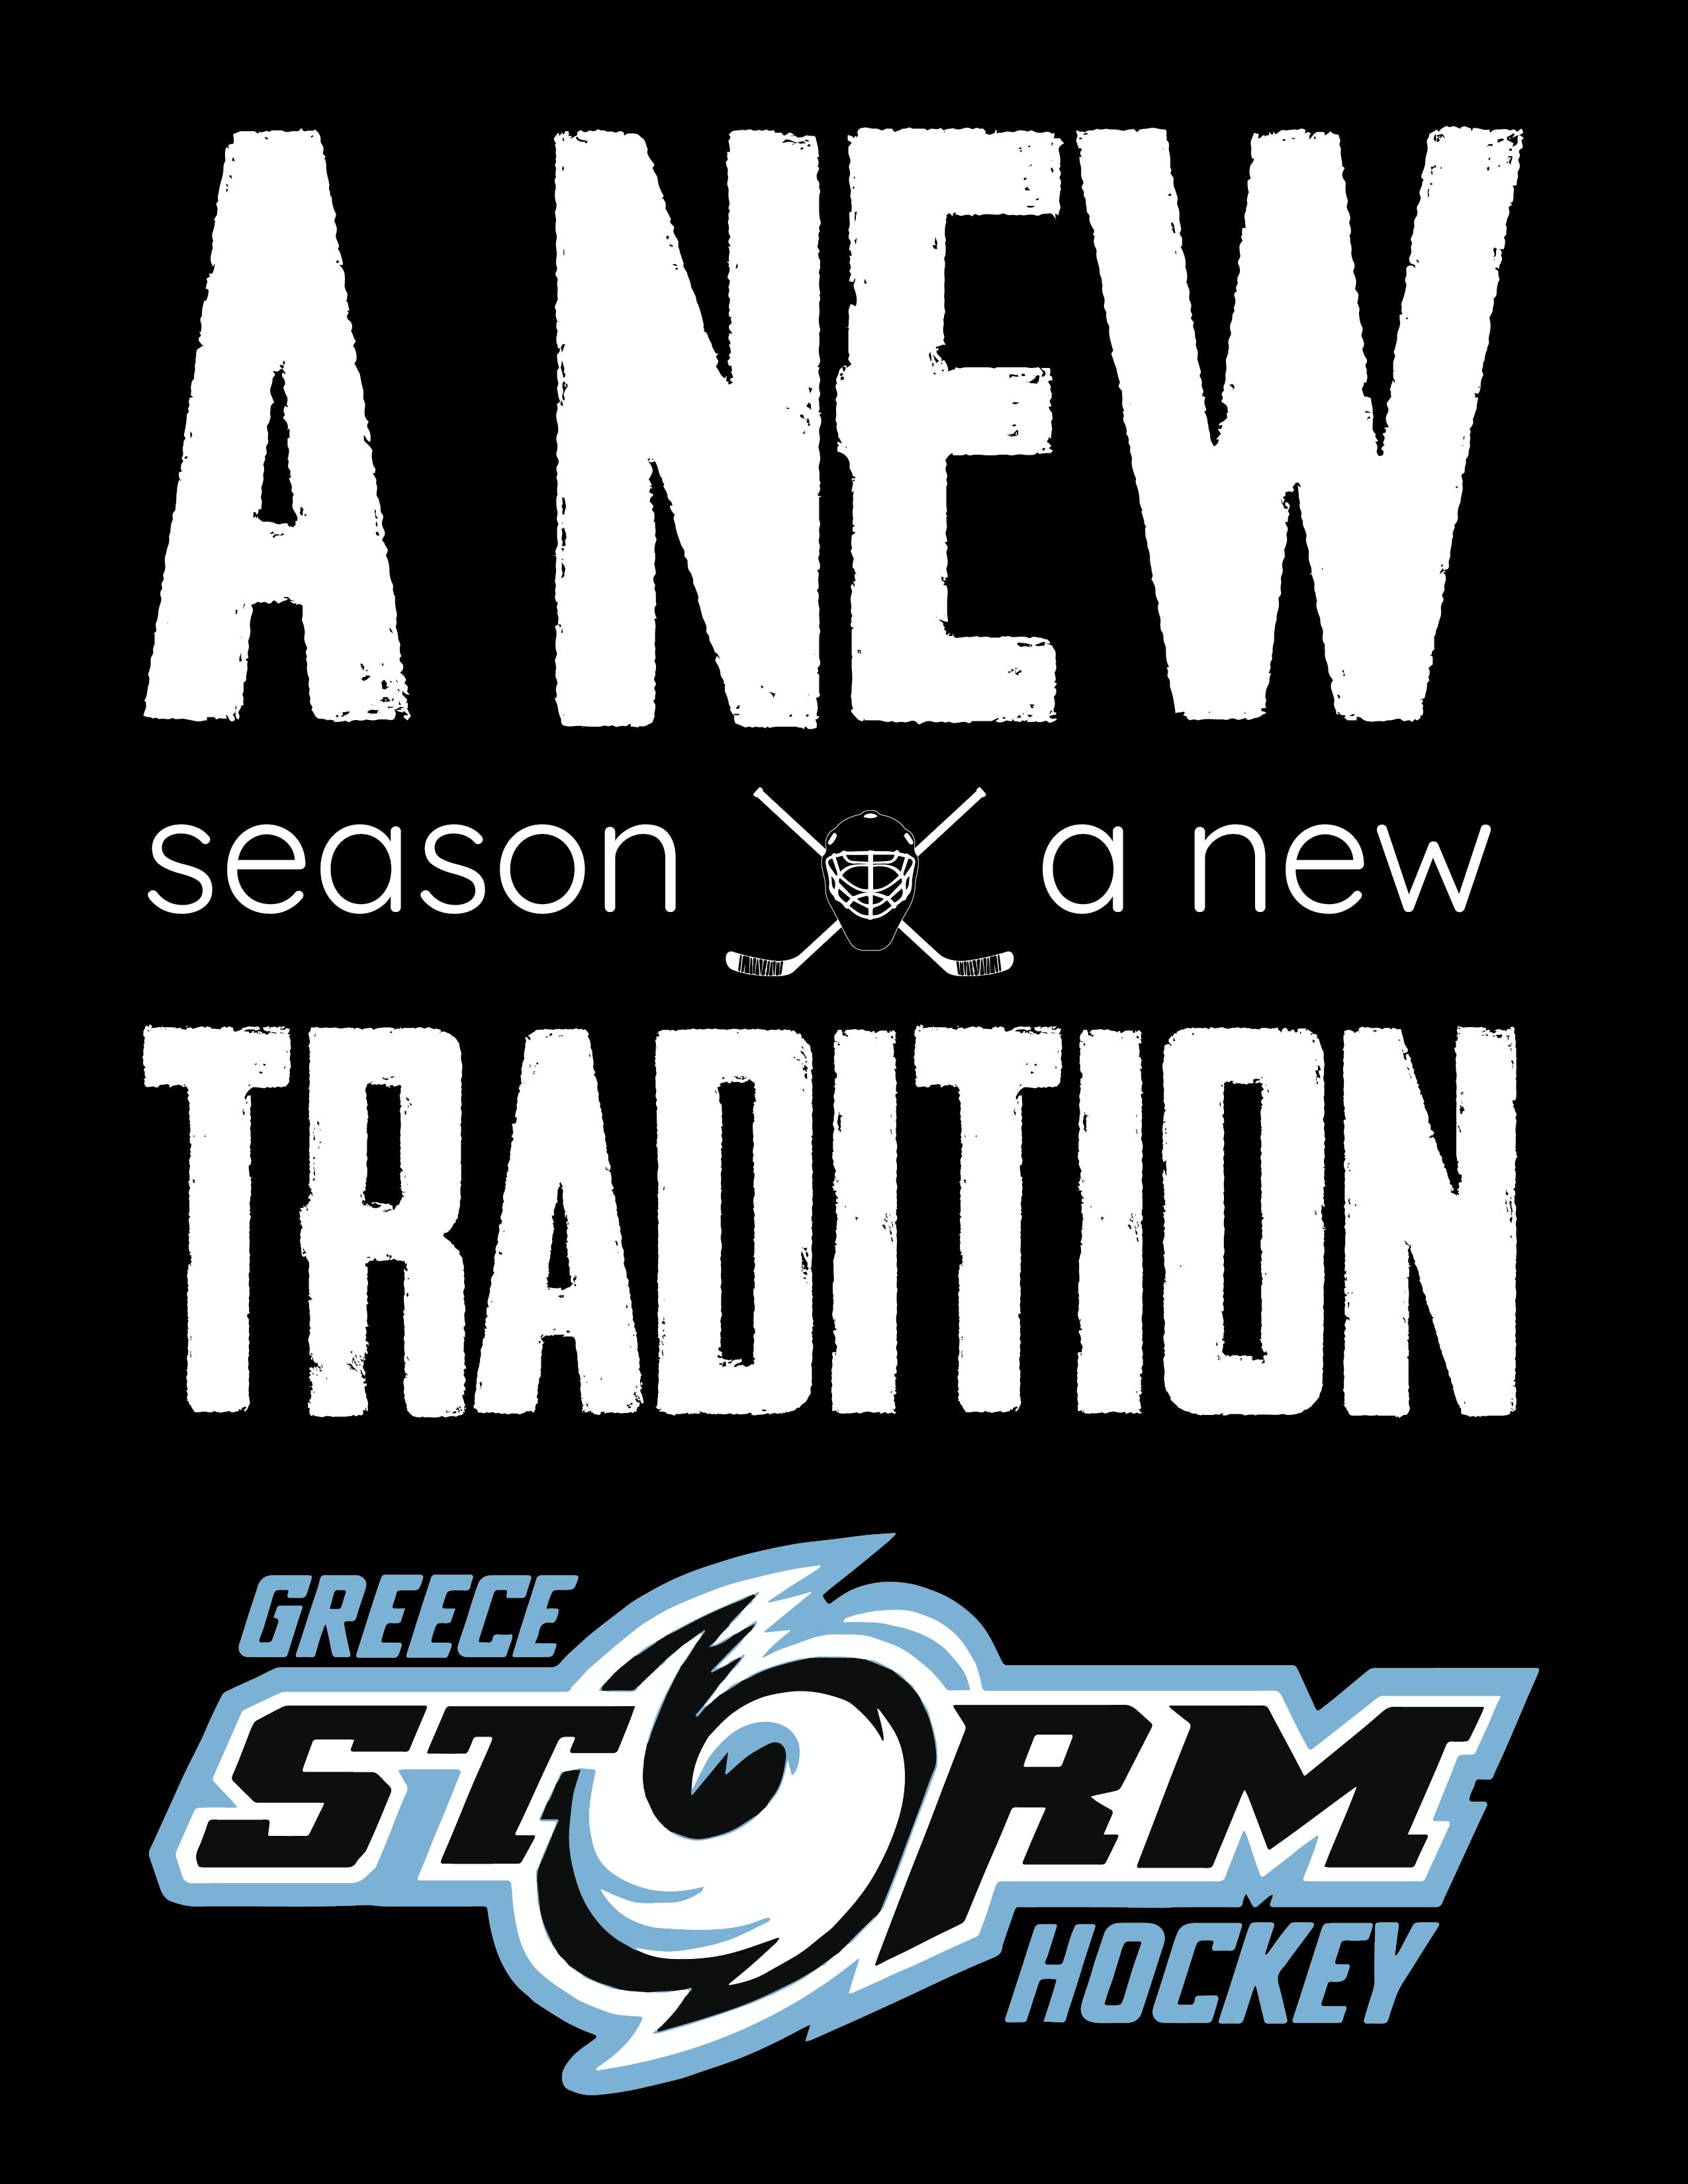 Greece Storm Hockey